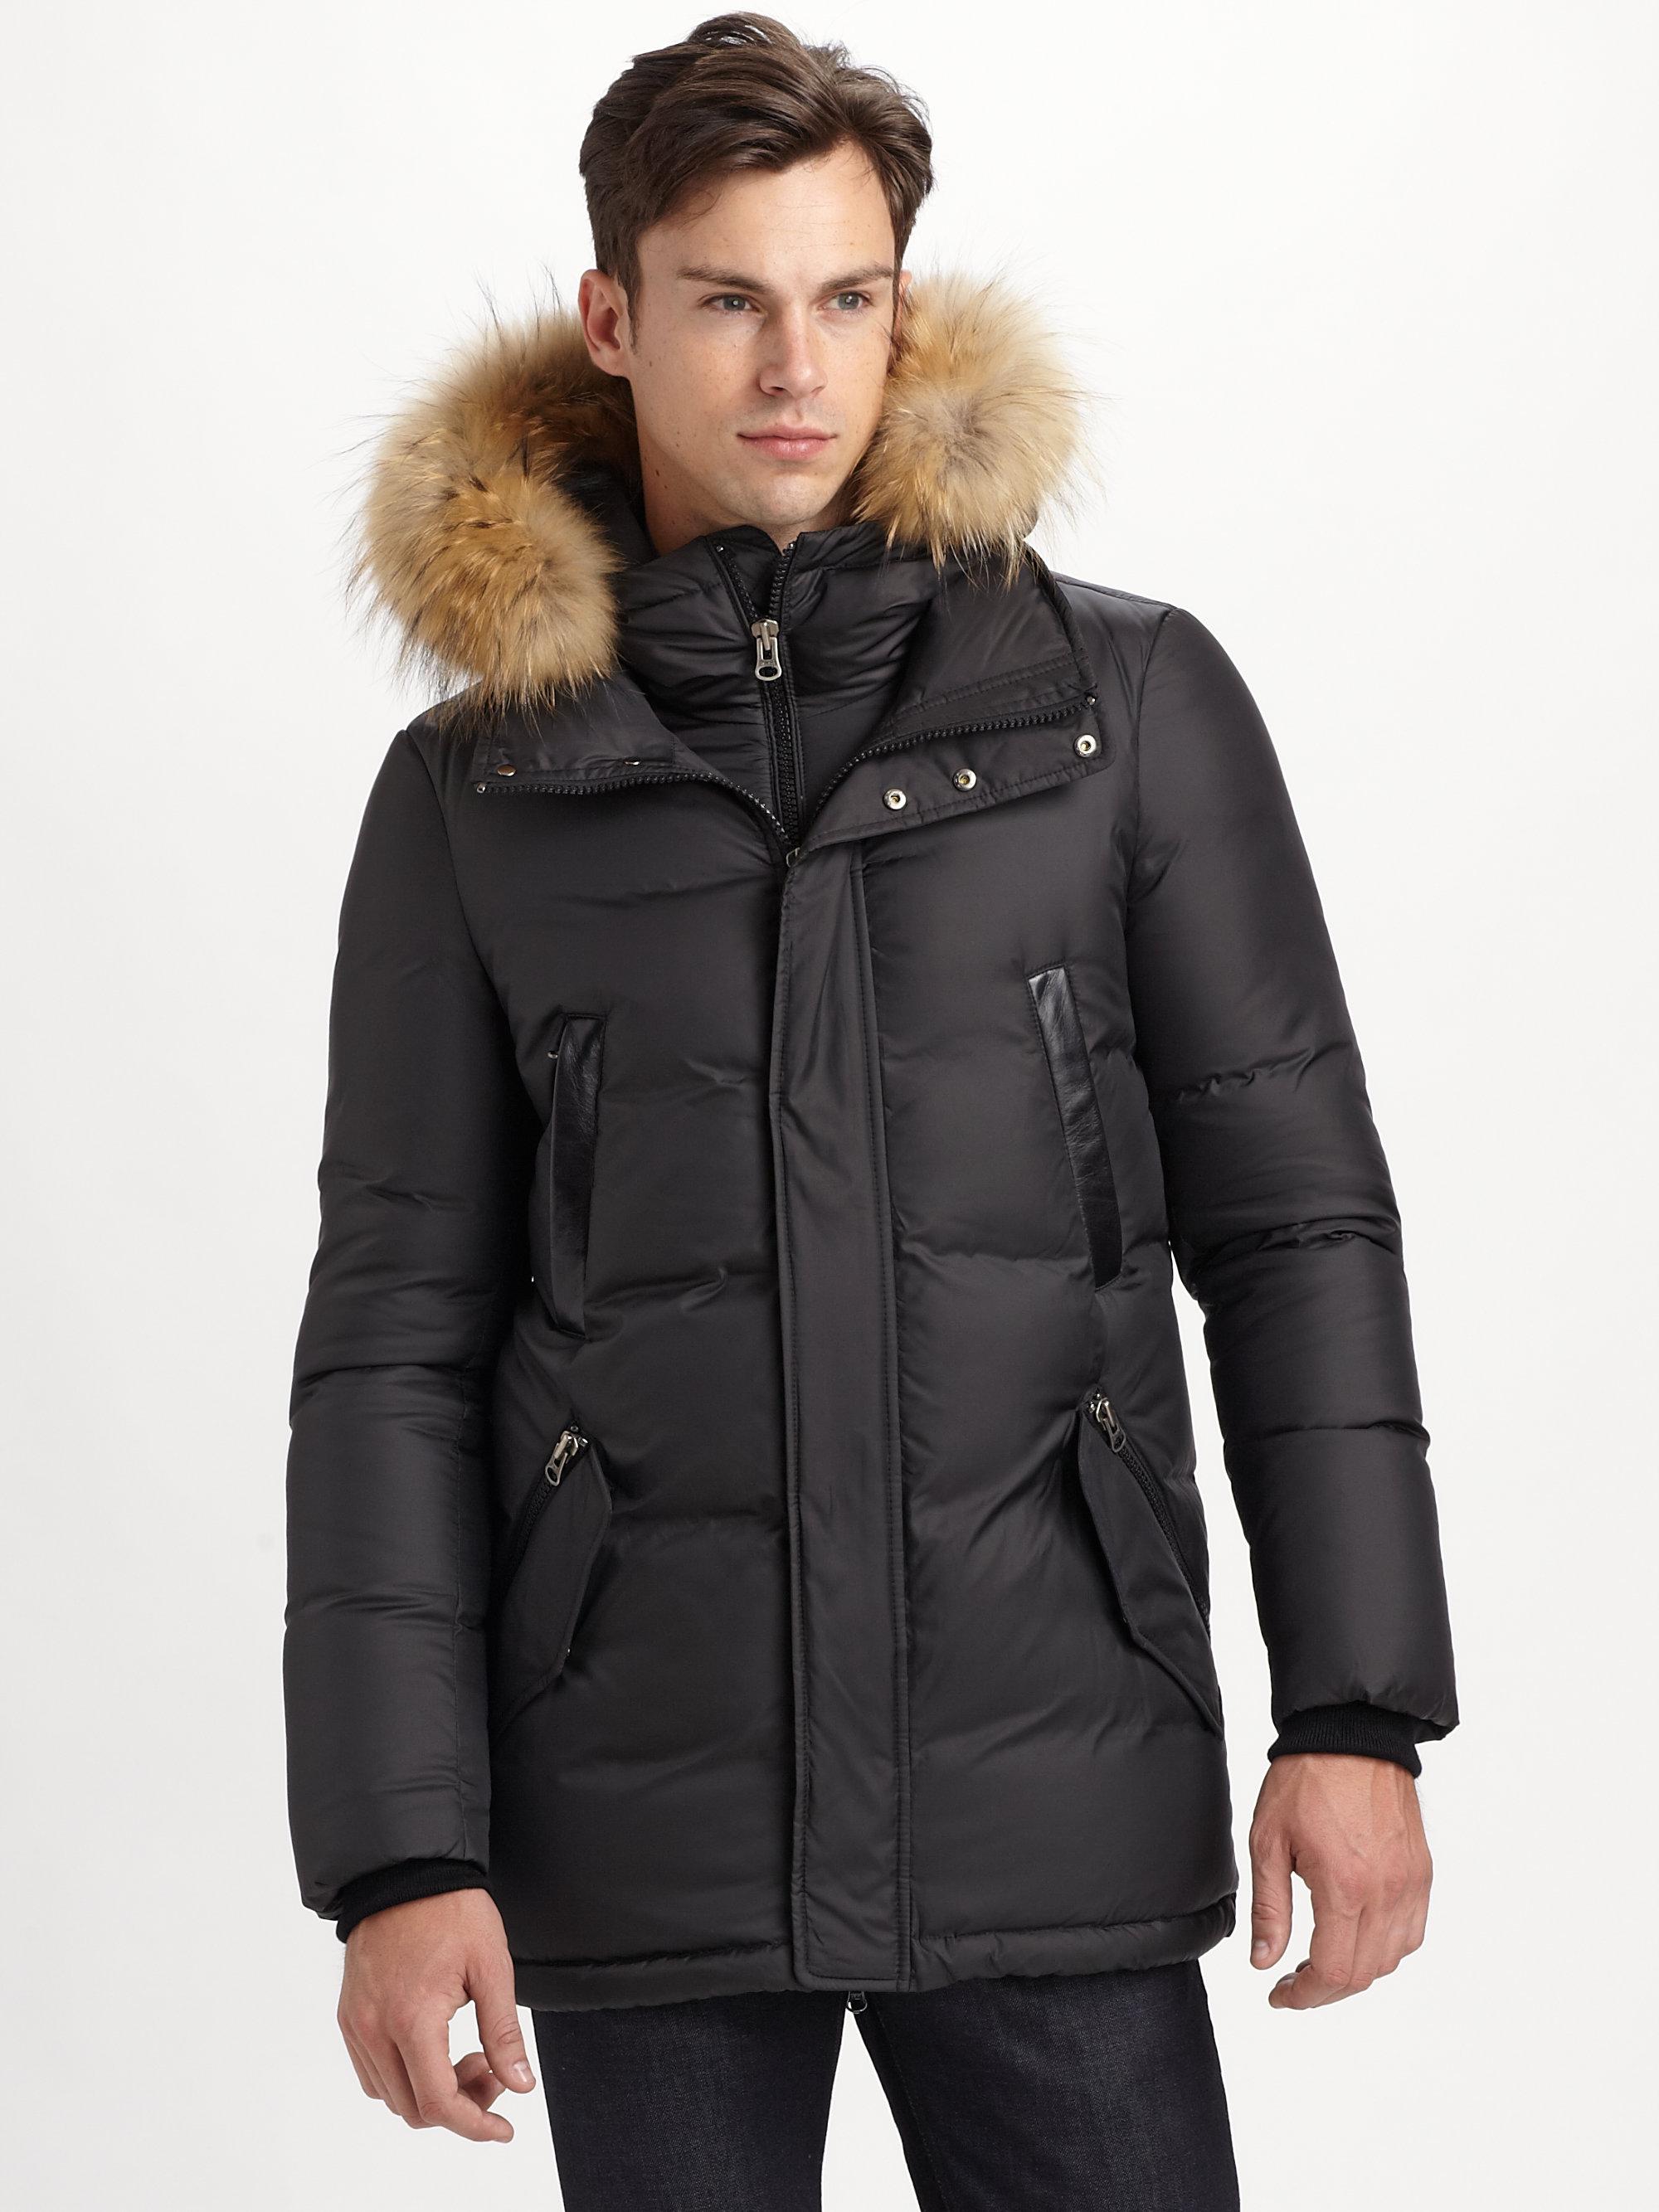 Product Description ZSHOW Men's Winter Coat Warm Outwear is a kind of cotton style jackets.